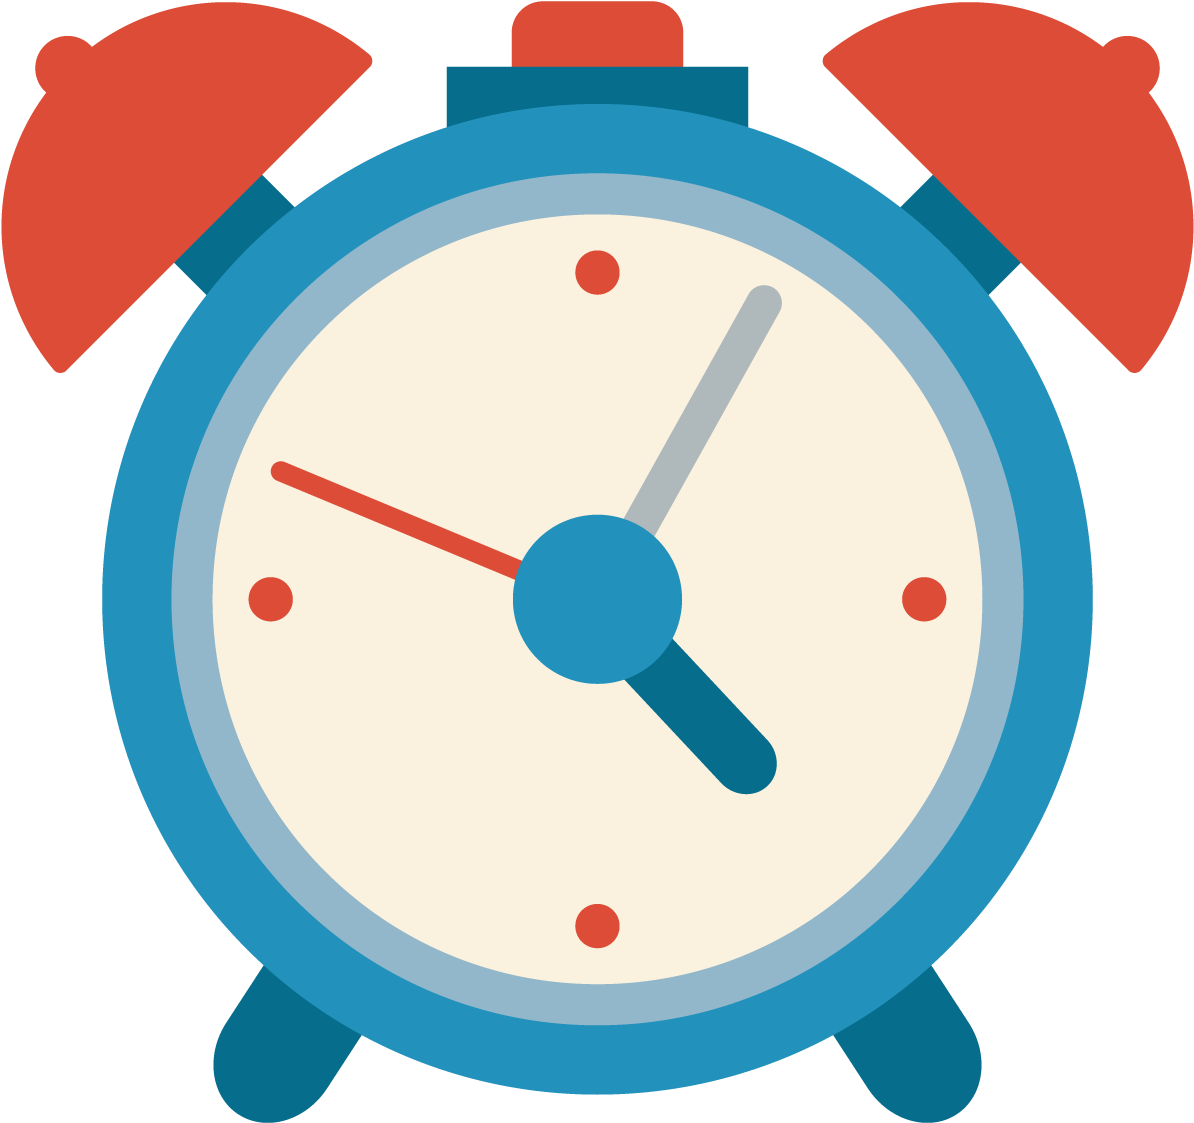 Alarm Clock Icon - Alarm Clock Icon Png (1500x1500), Png ...